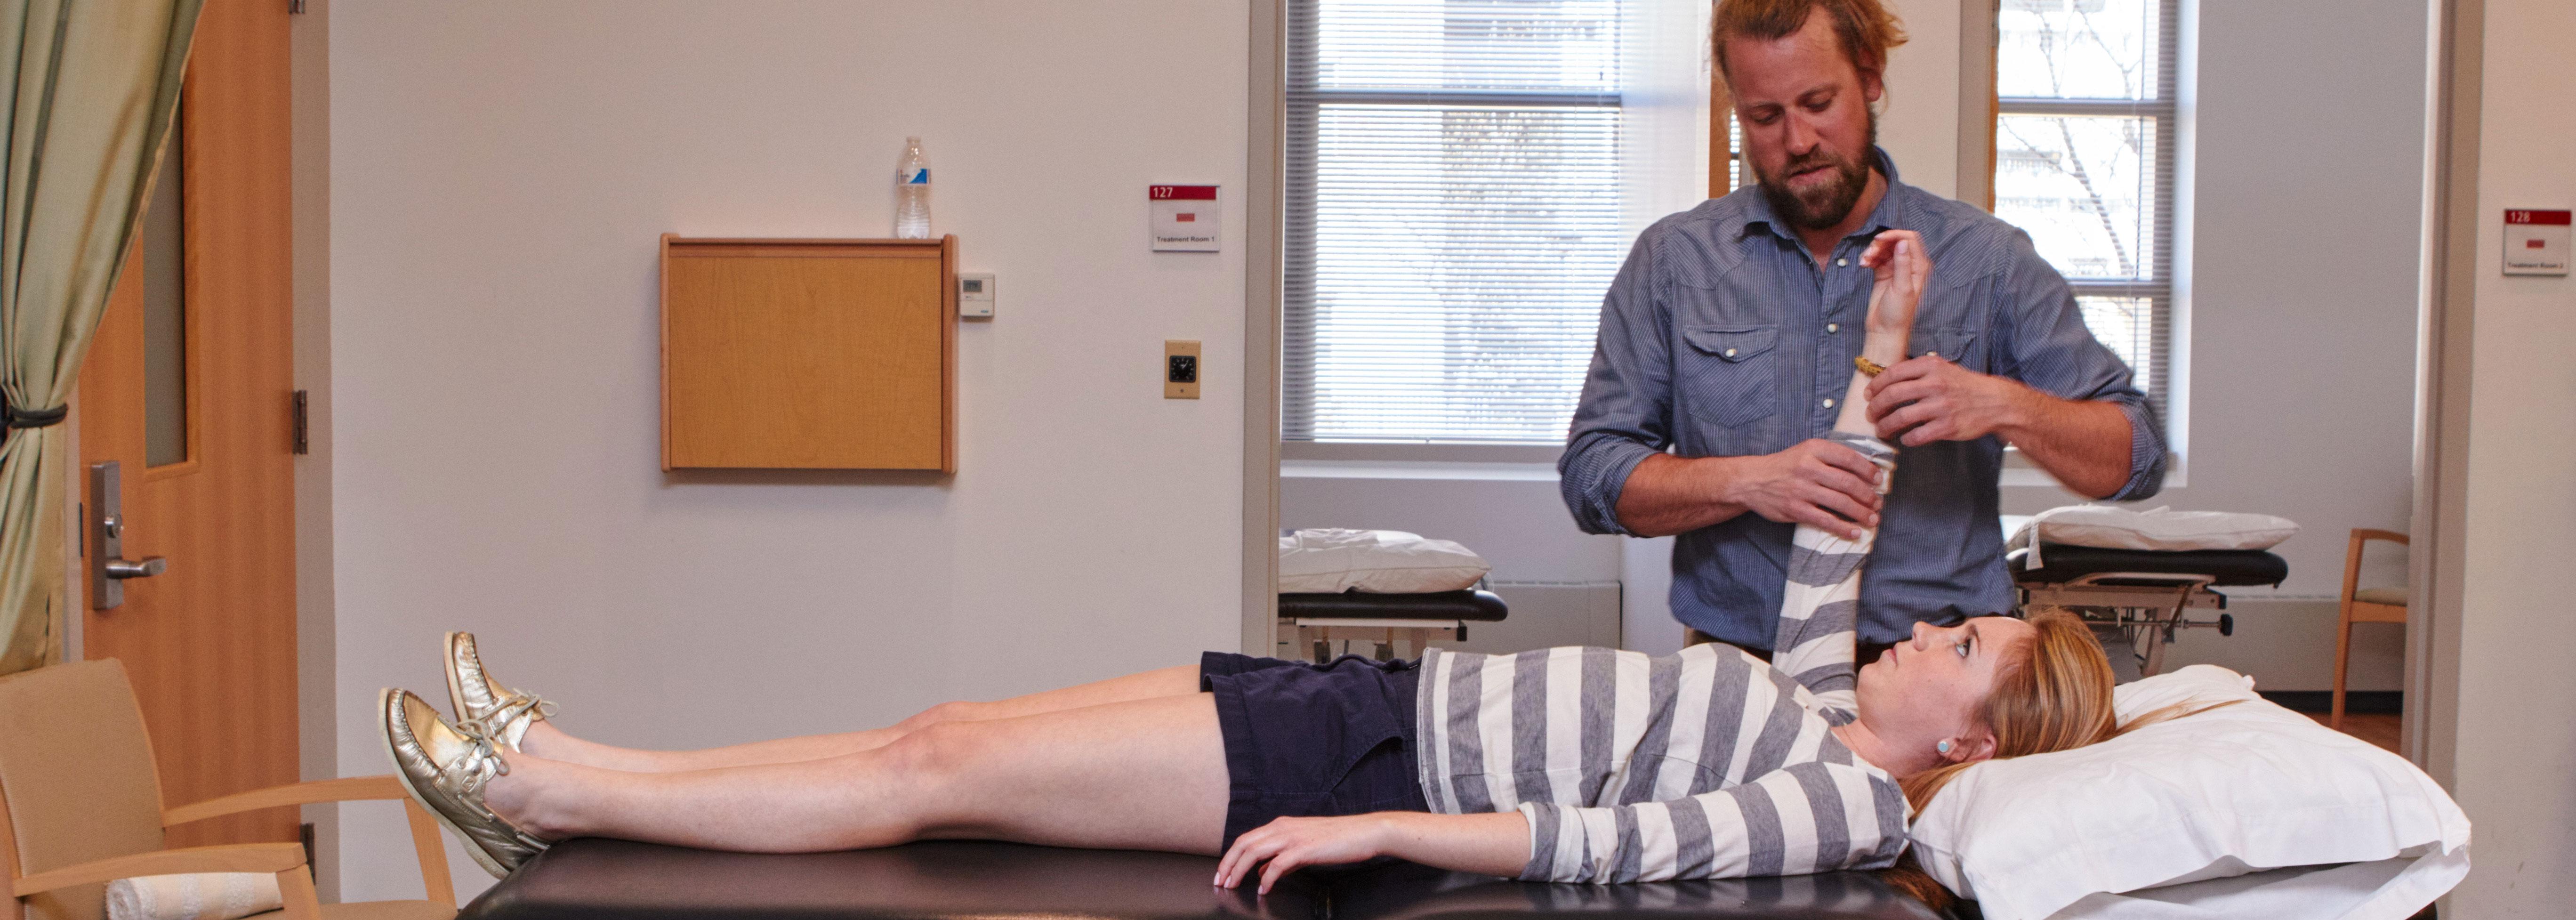 Boston physical therapy university - Diagnoses Boston University Physical Therapy Center Buptc Brookline Brighton Allston Ma